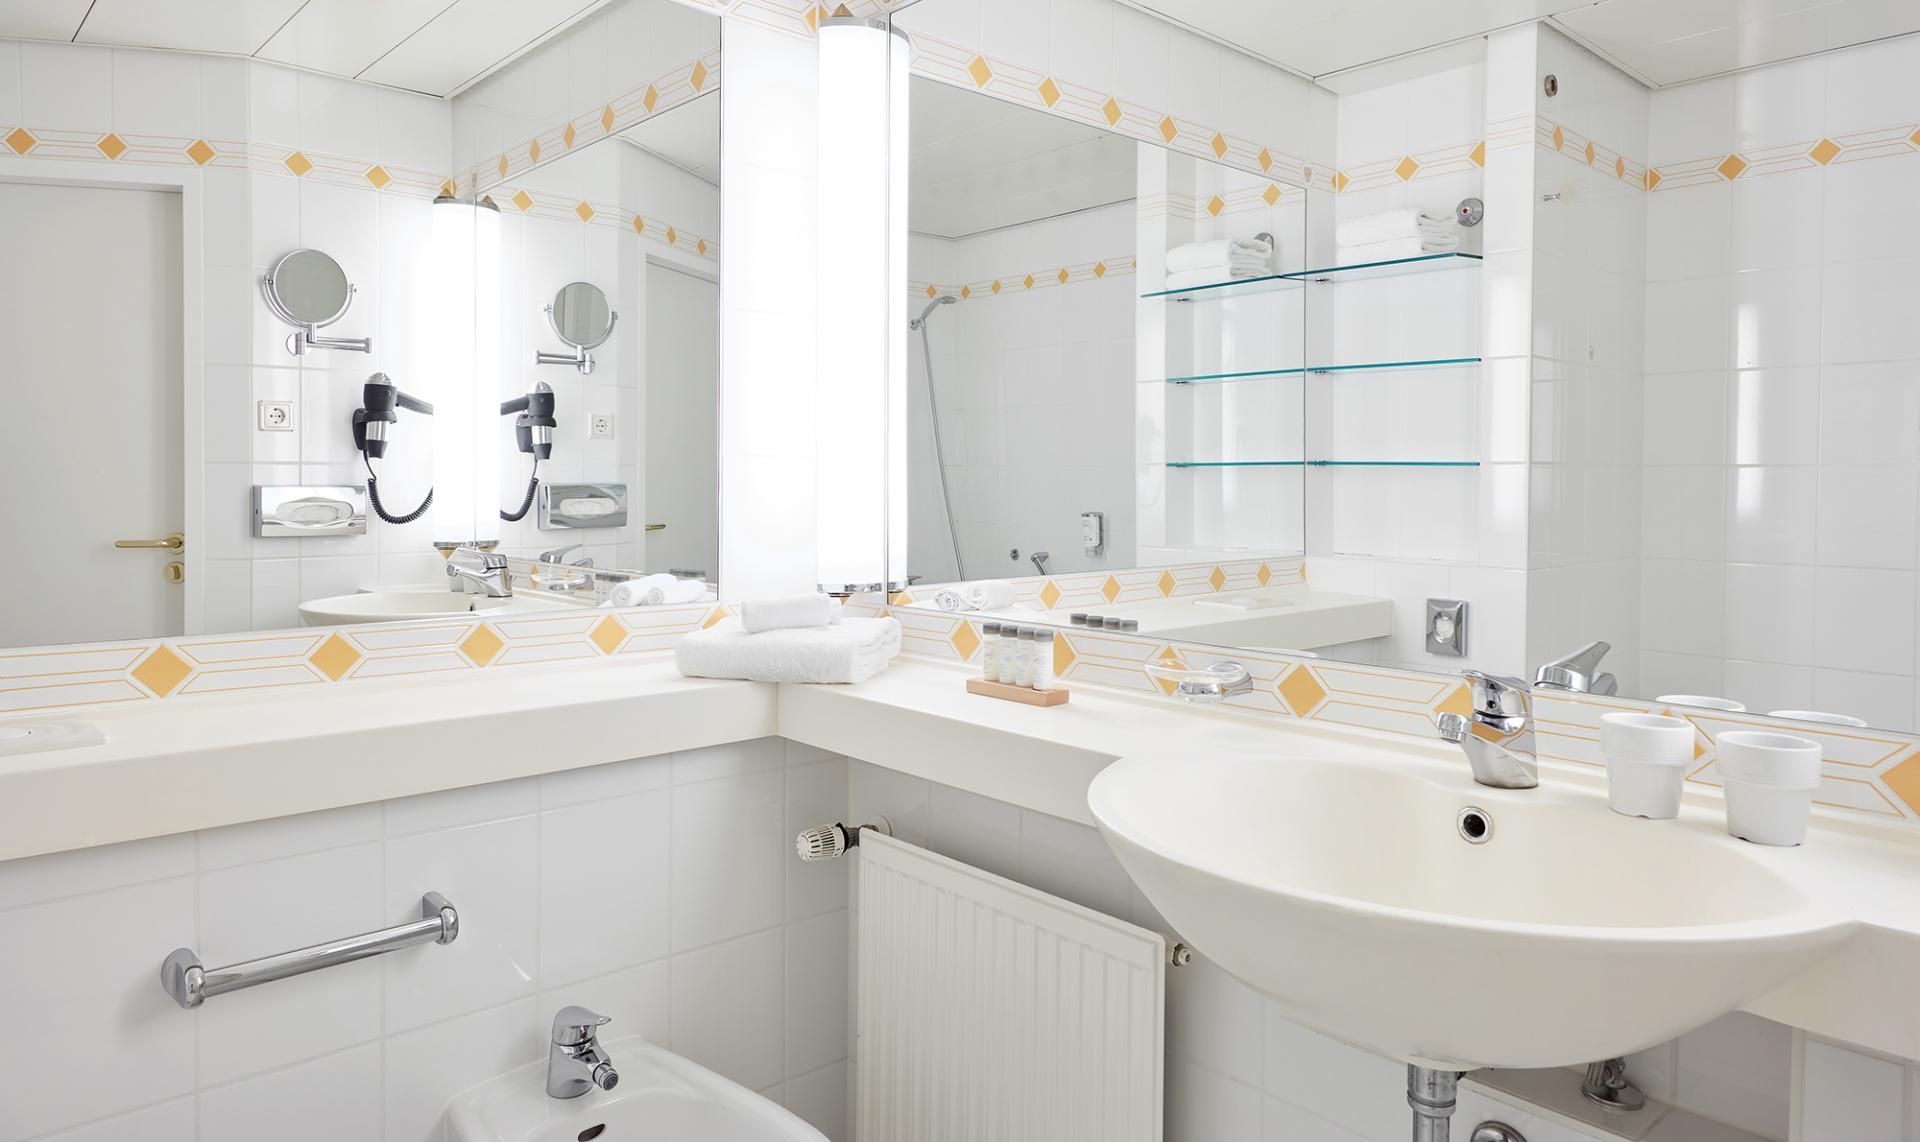 Bathroom at Living Hotel Grosser Kurfurst Apartments, Berlin Mitte, Berlin